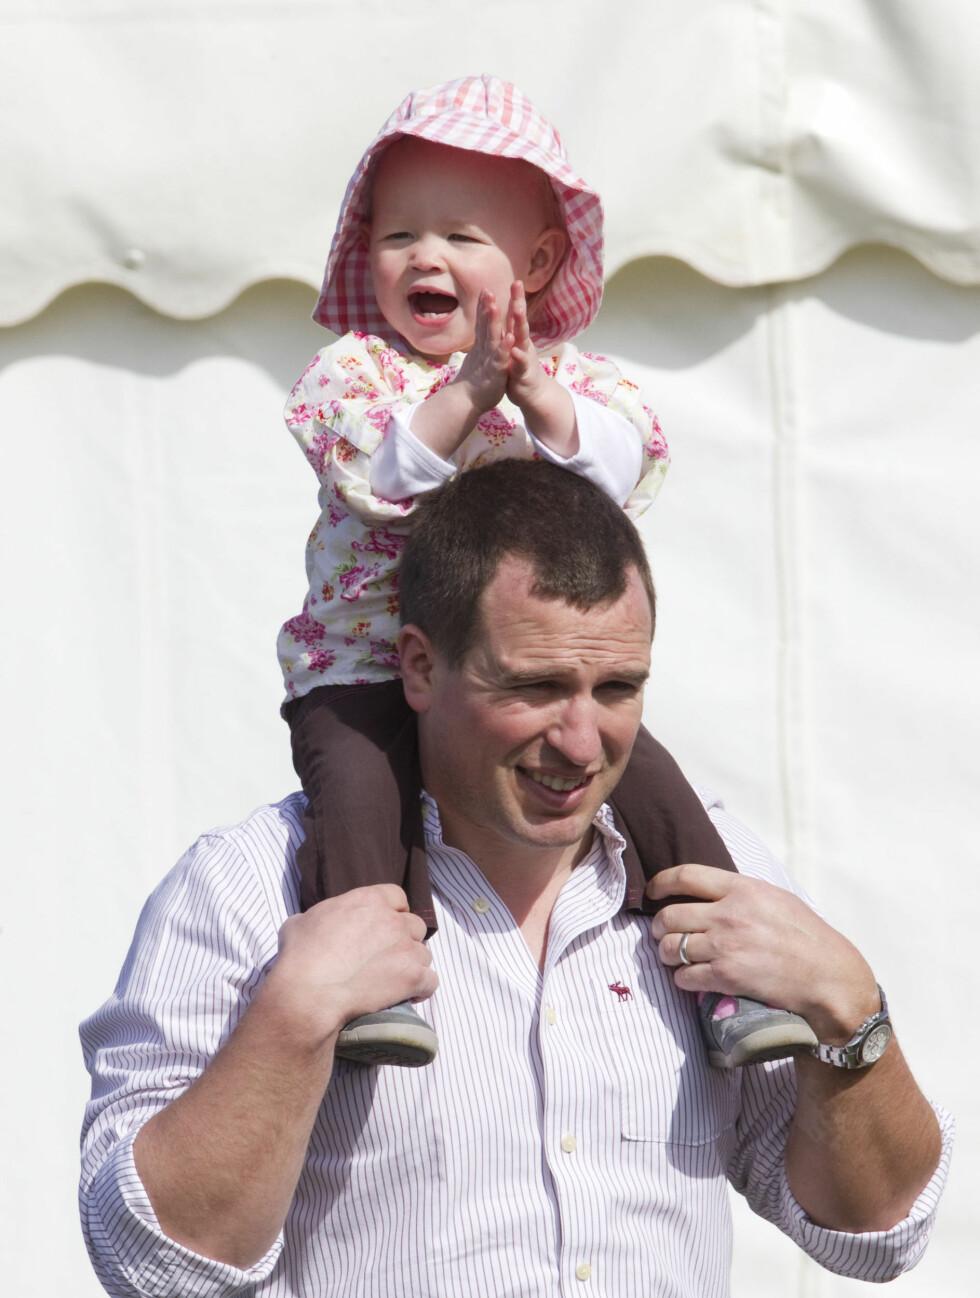 PAPPAJENTE: Ettåringen var trygg på pappas skuldre.  Foto: Stella Pictures